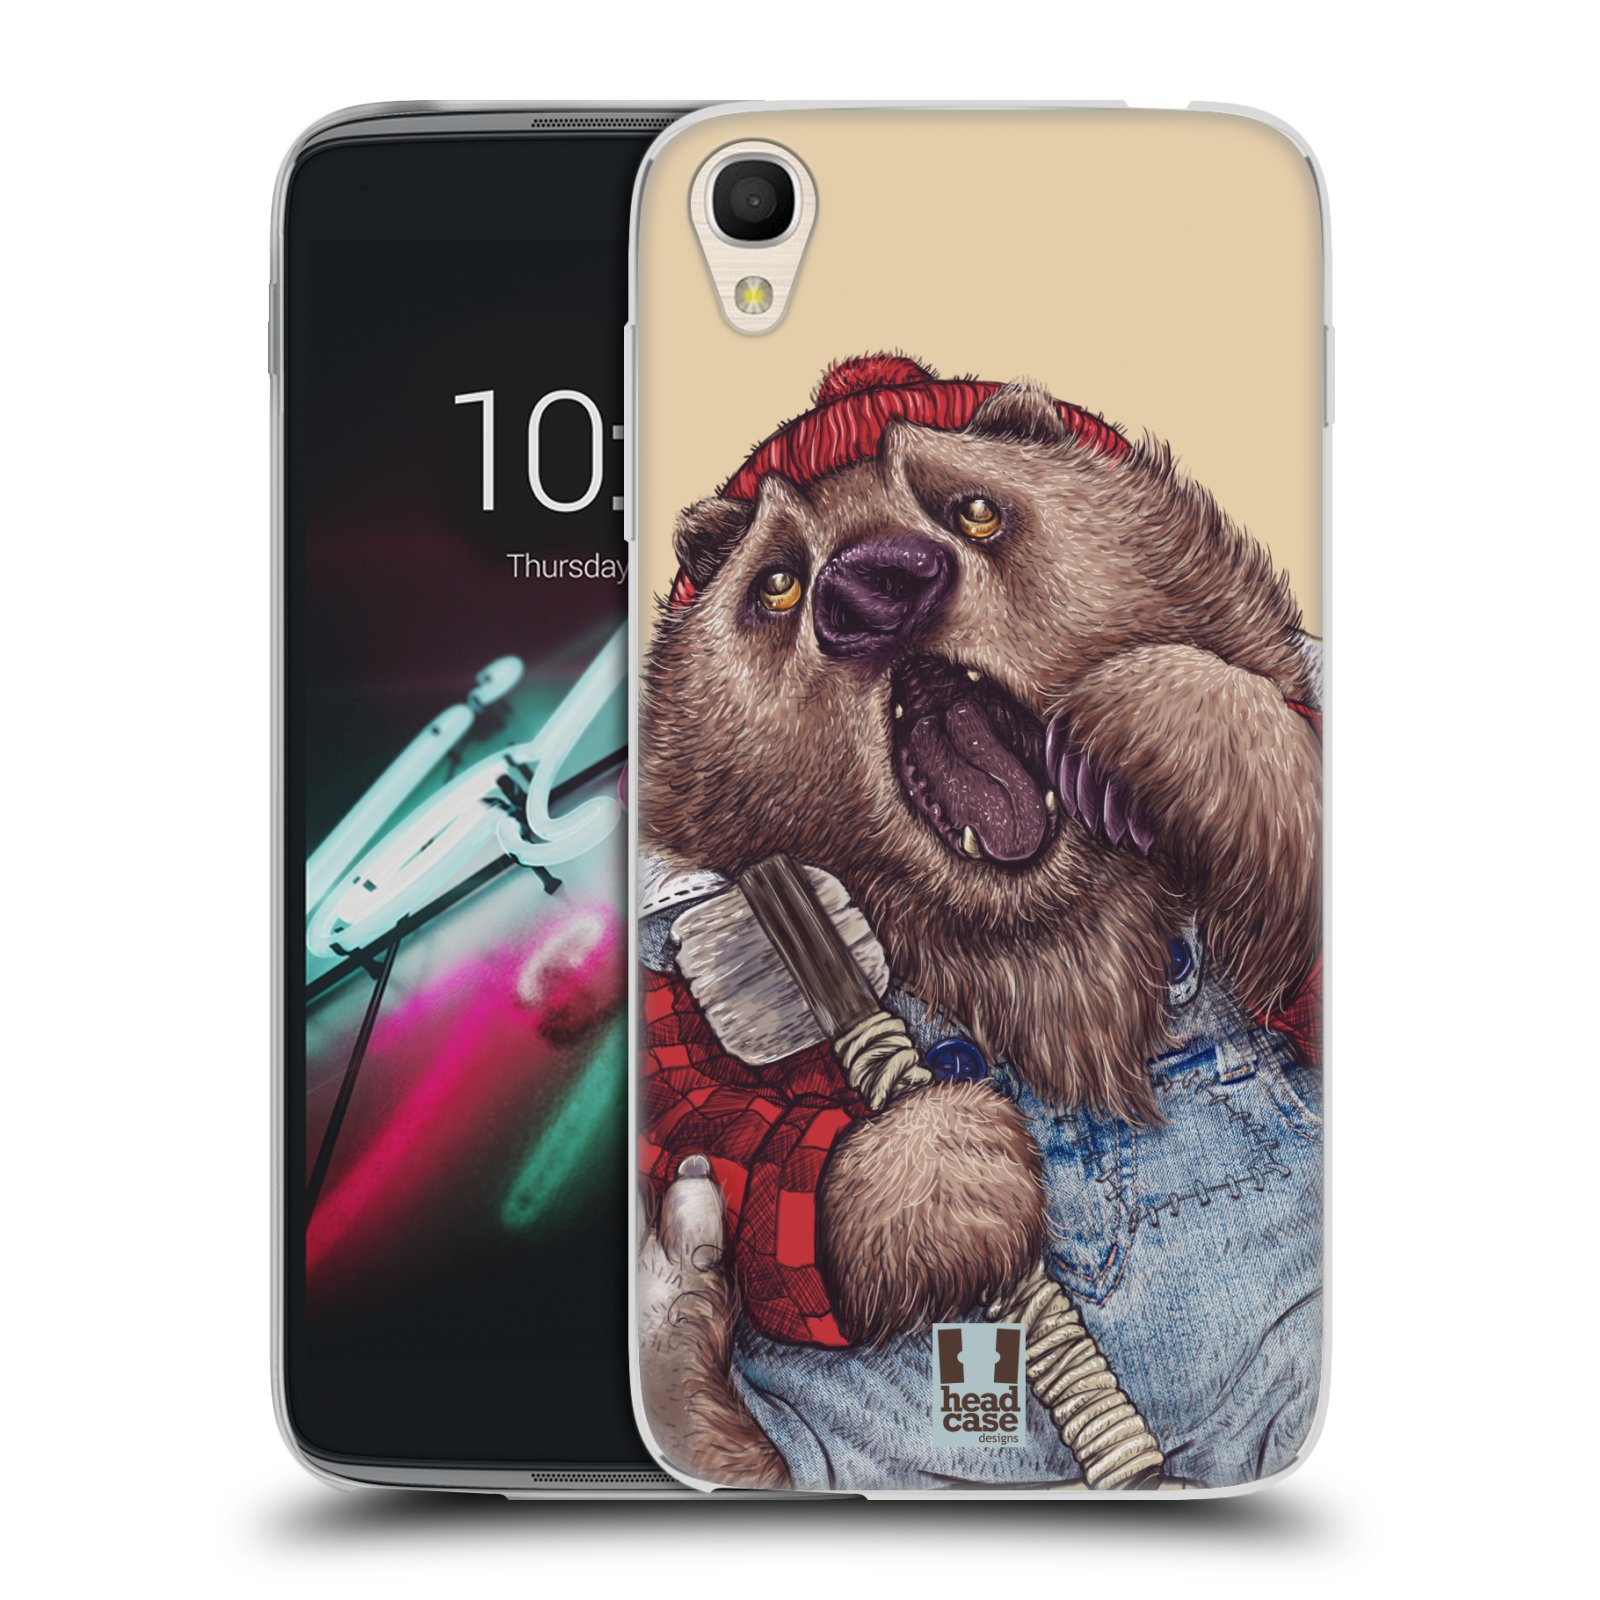 HEAD CASE silikonový obal na mobil Alcatel Idol 3 OT-6039Y (4.7) vzor Kreslená zvířátka medvěd